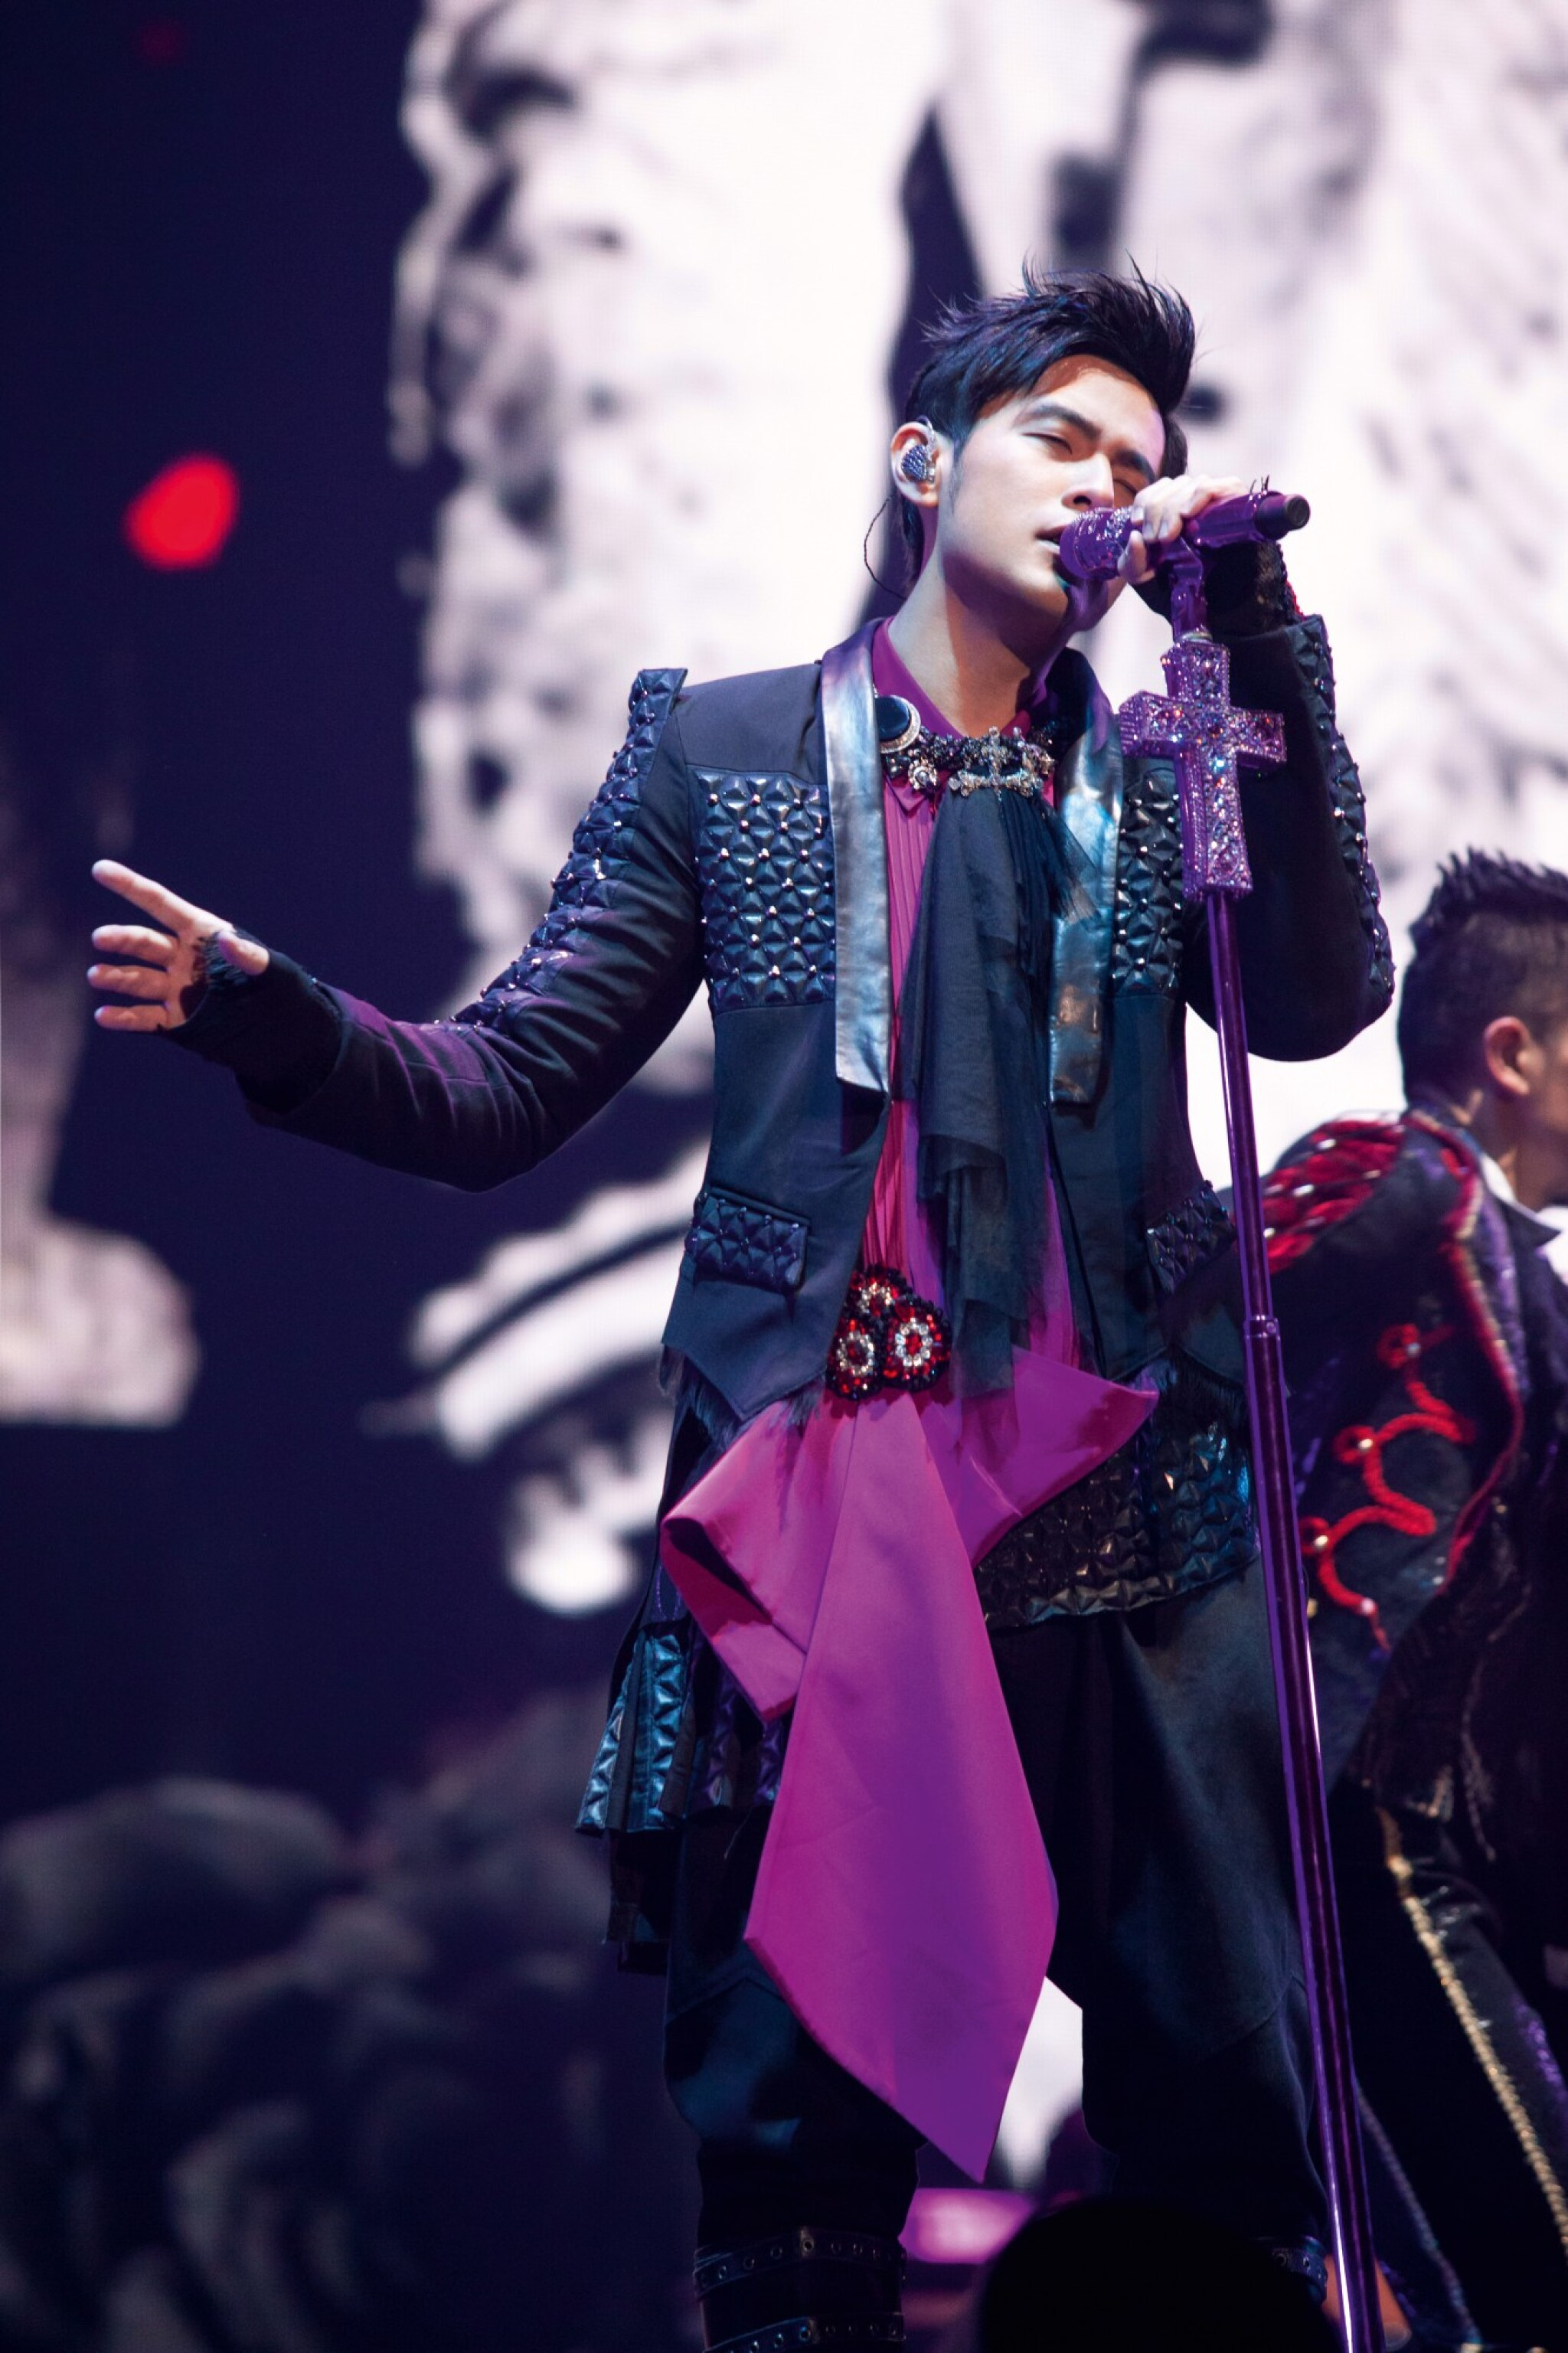 View full screen - View 1 of Lot 22. Tomas Chan   Jay Chou The Invincible 1 World Tour Costume (2016-2017) 周杰倫「地表最強1」世界巡迴演唱會舞台服裝(2016-2017).